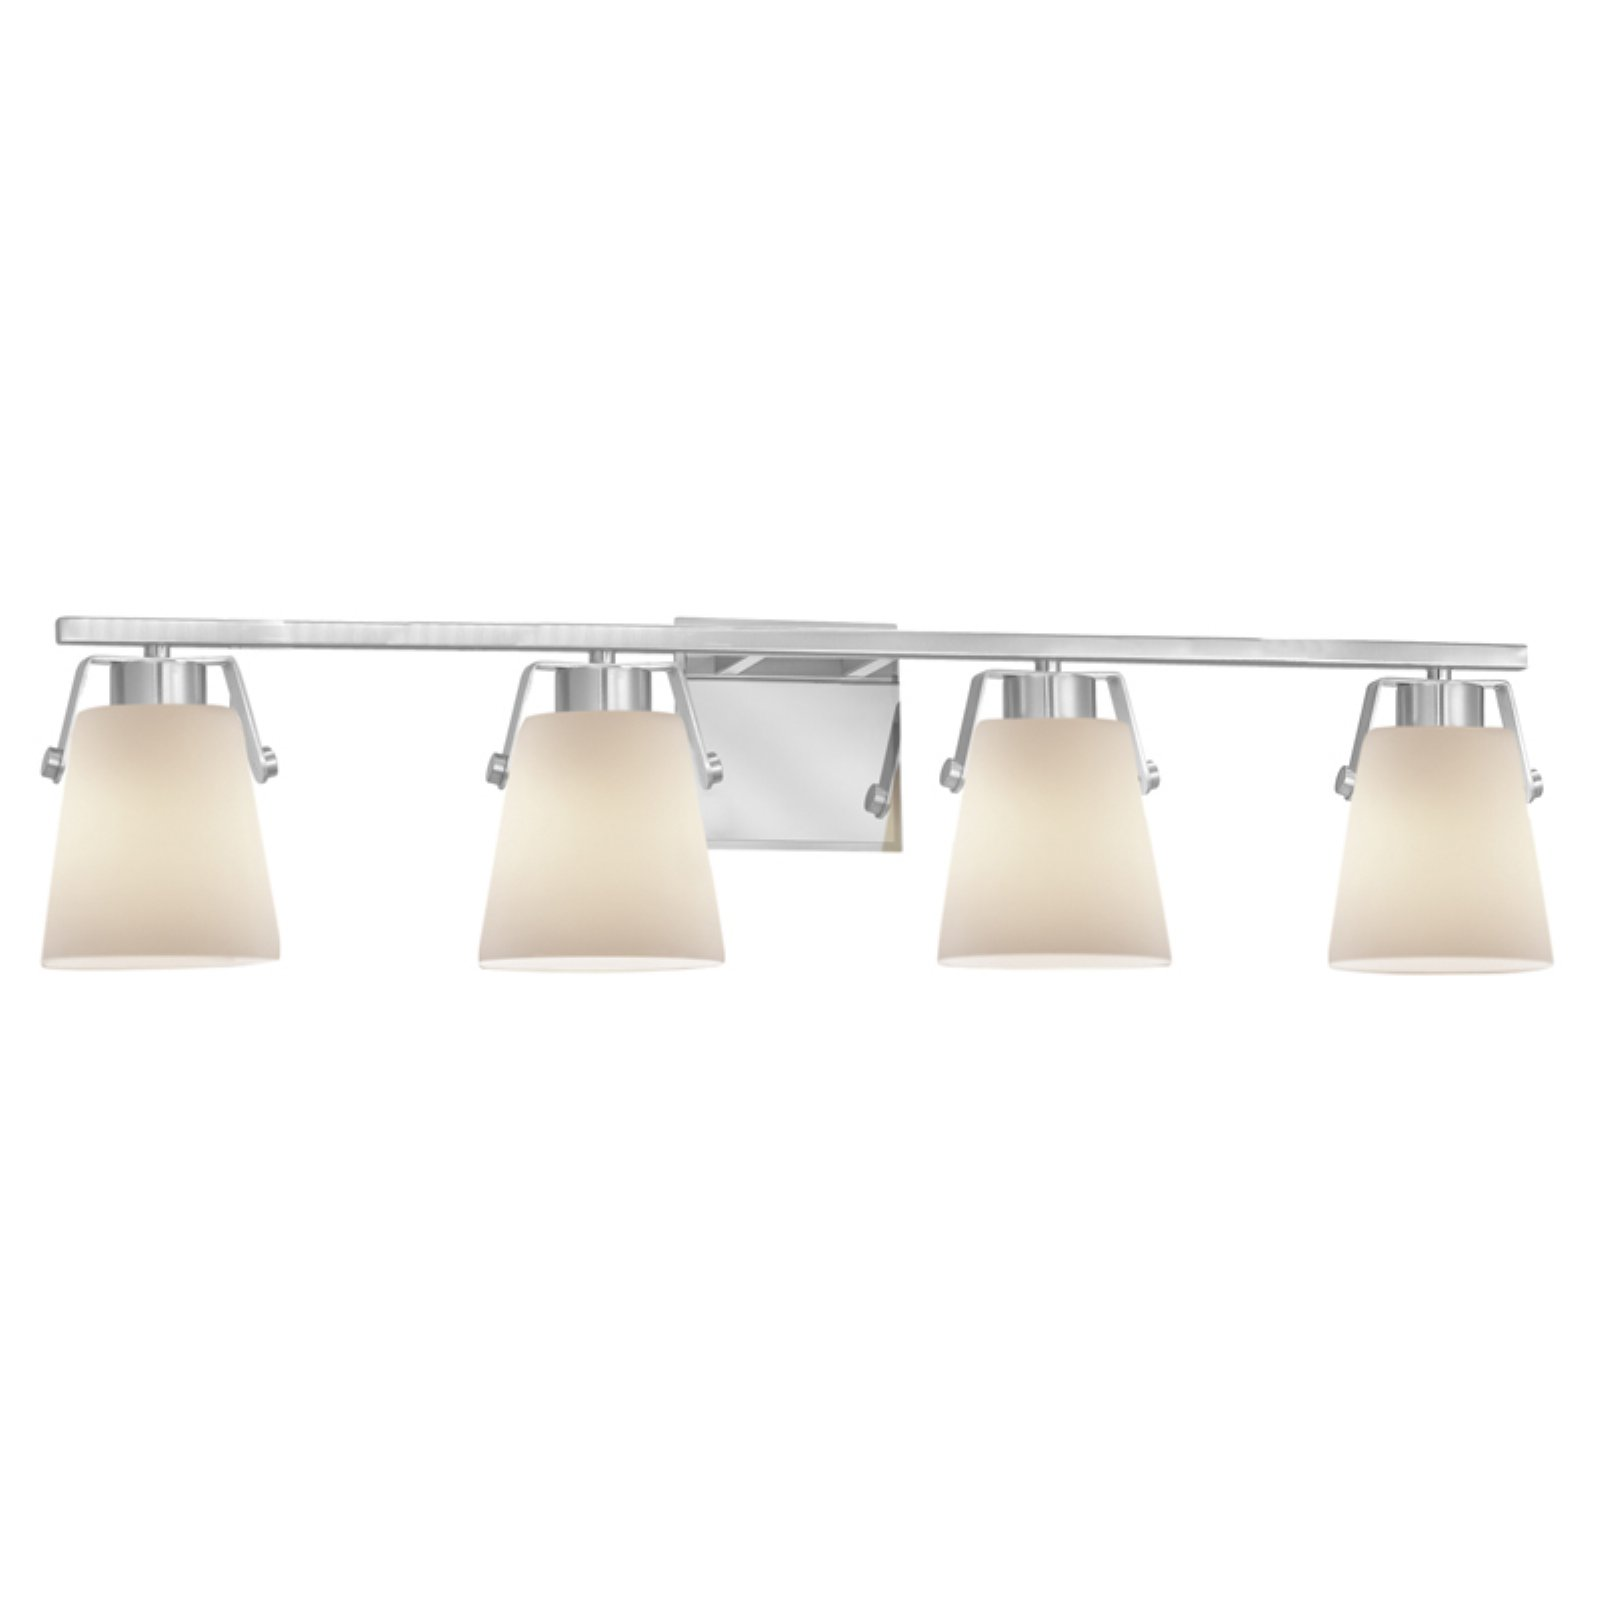 Justice Design Fusion Nexus 4 Light Bathroom Vanity Light